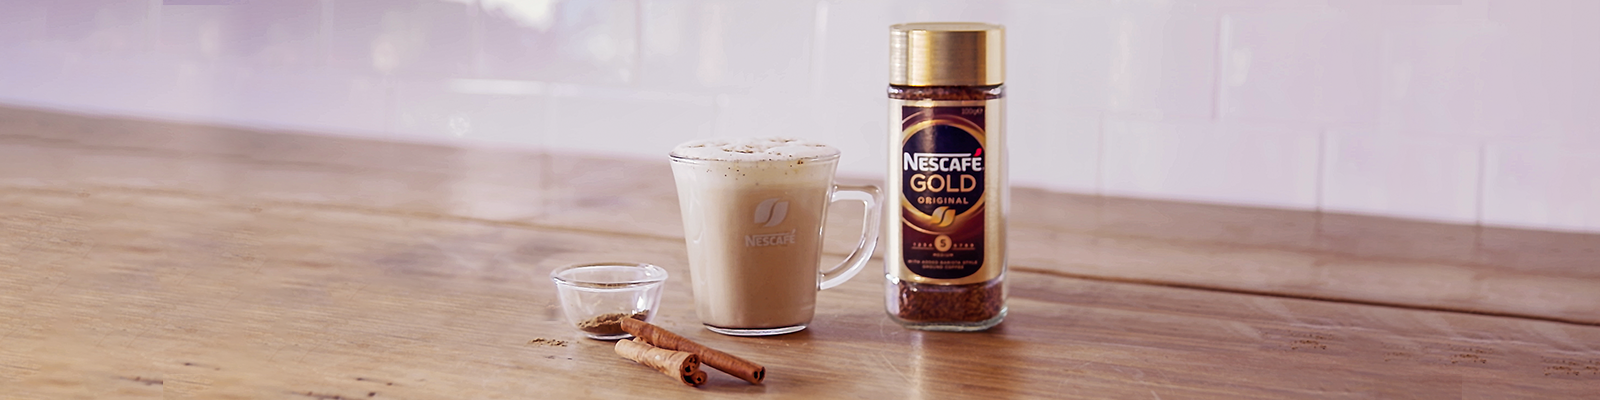 NESCAFE Gold Pumpkin Spice Latte instant Coffee recipe